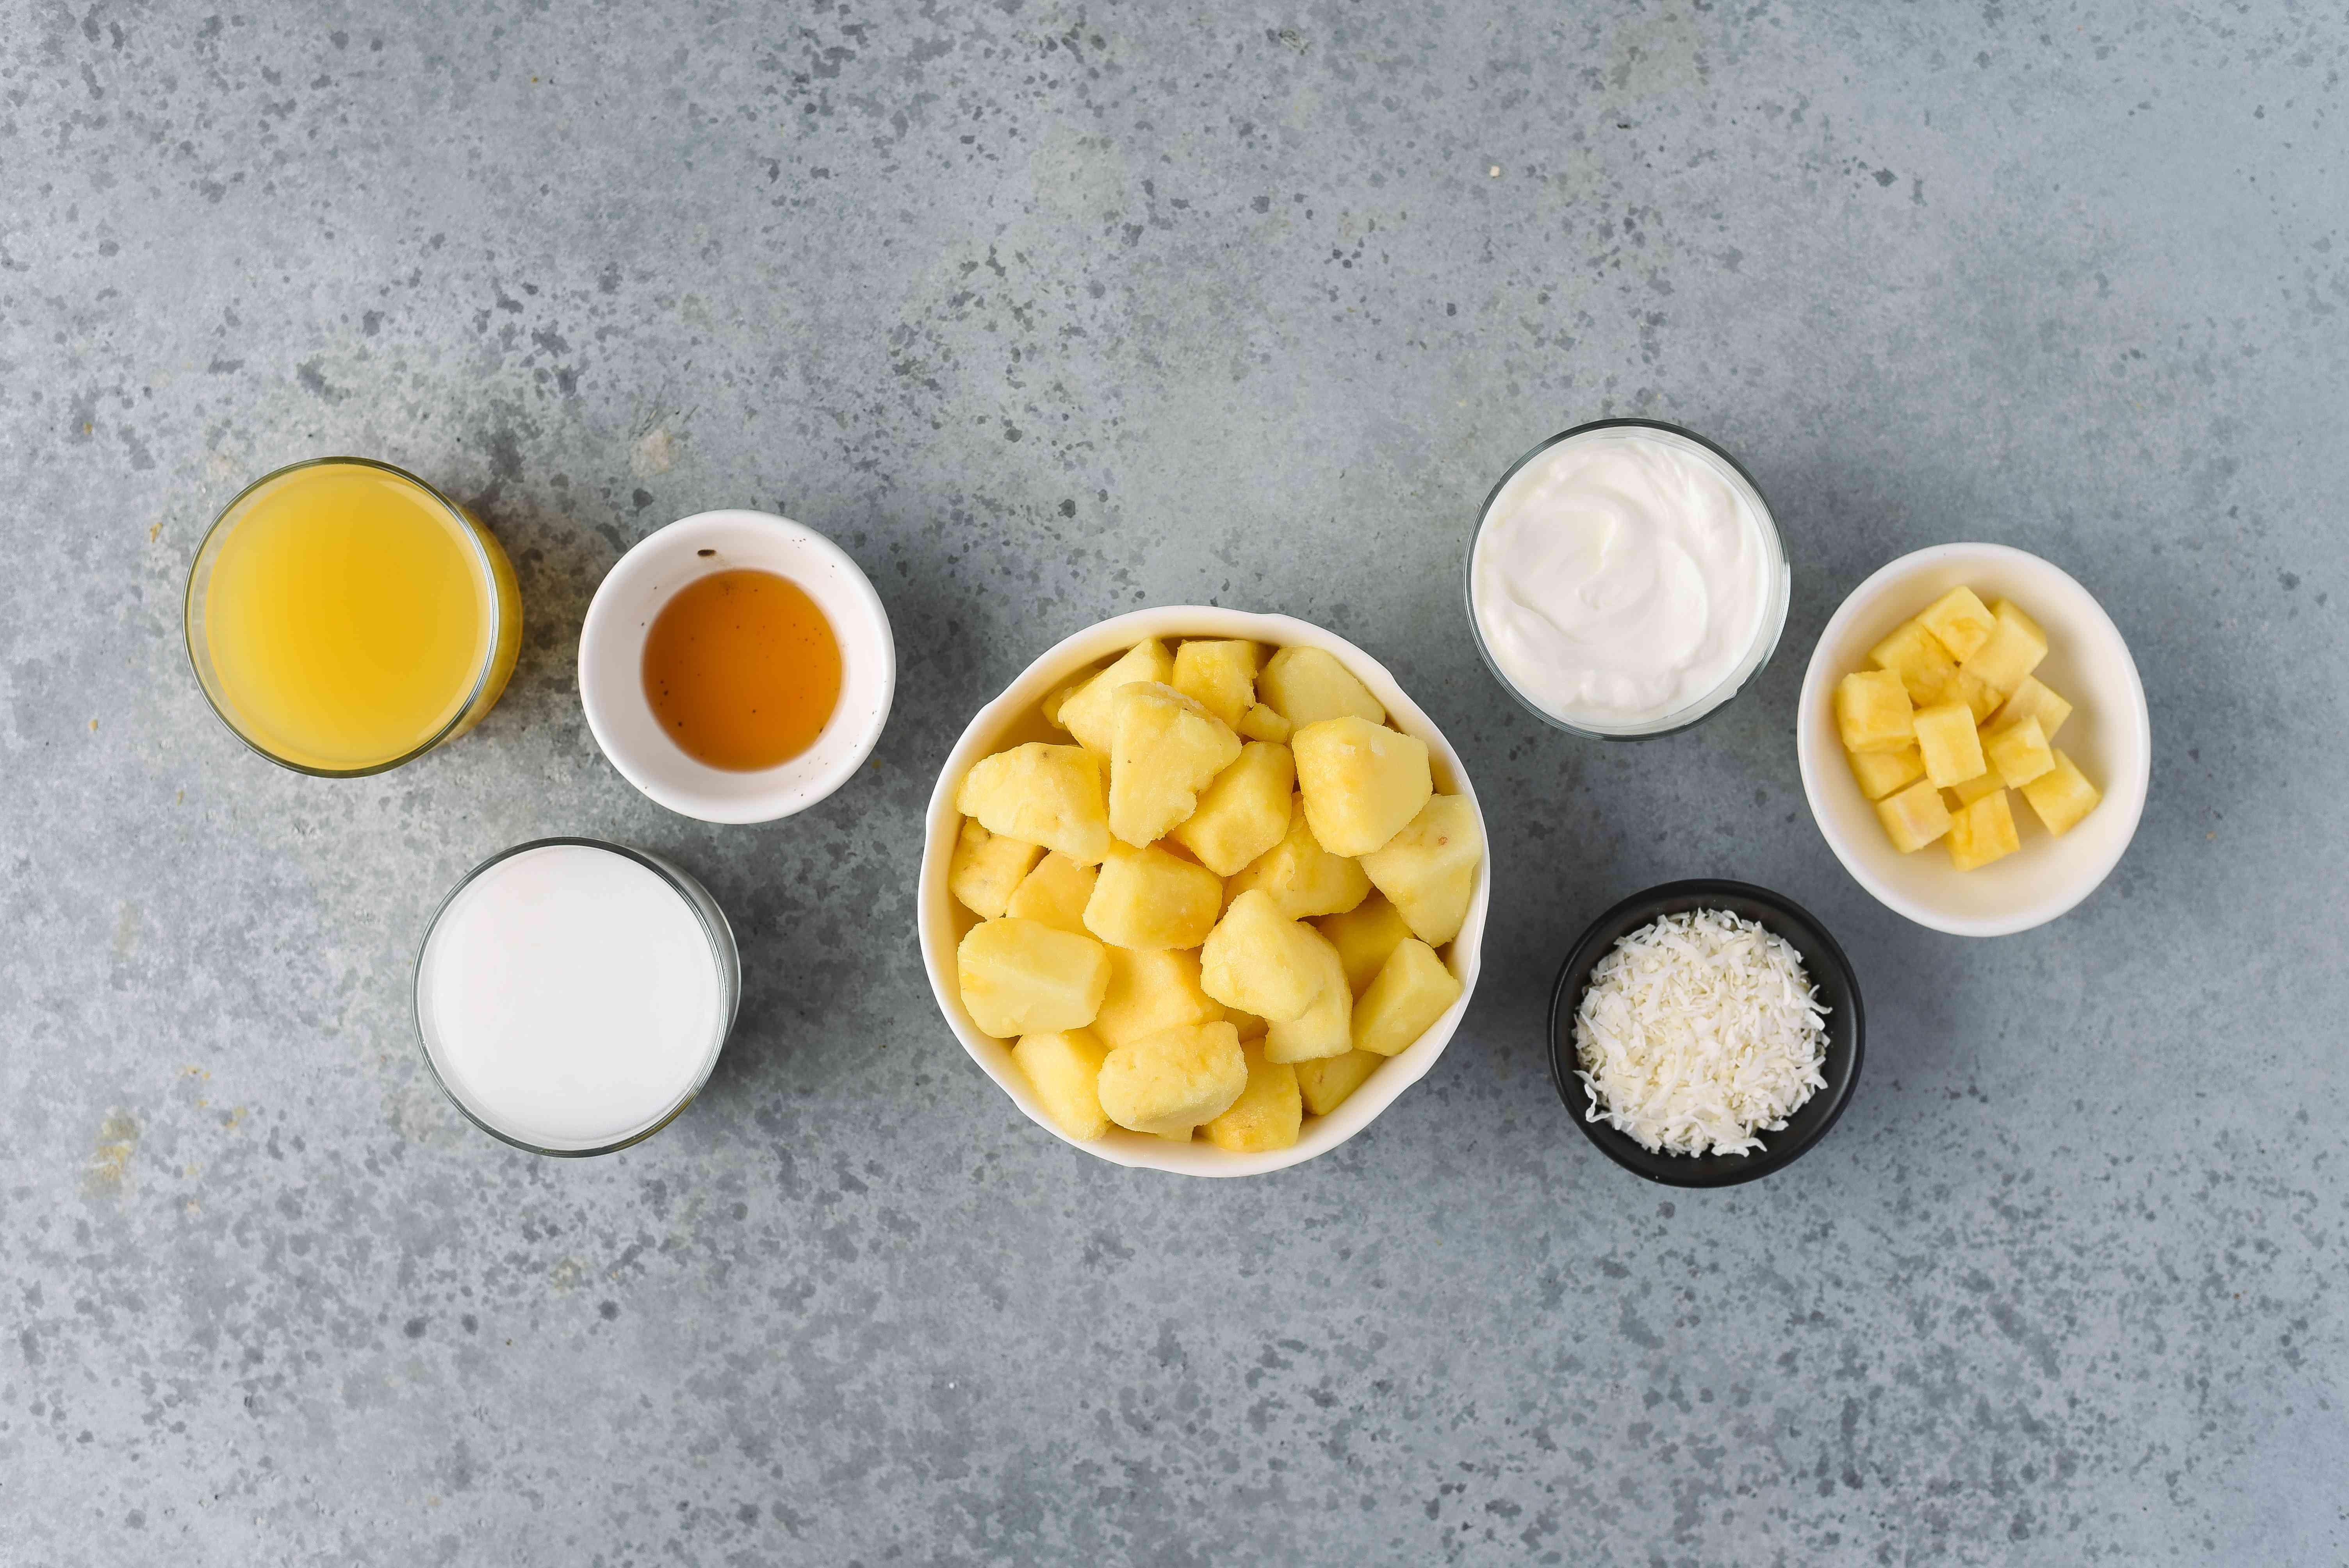 Pineapple Coconut Smoothie ingredients